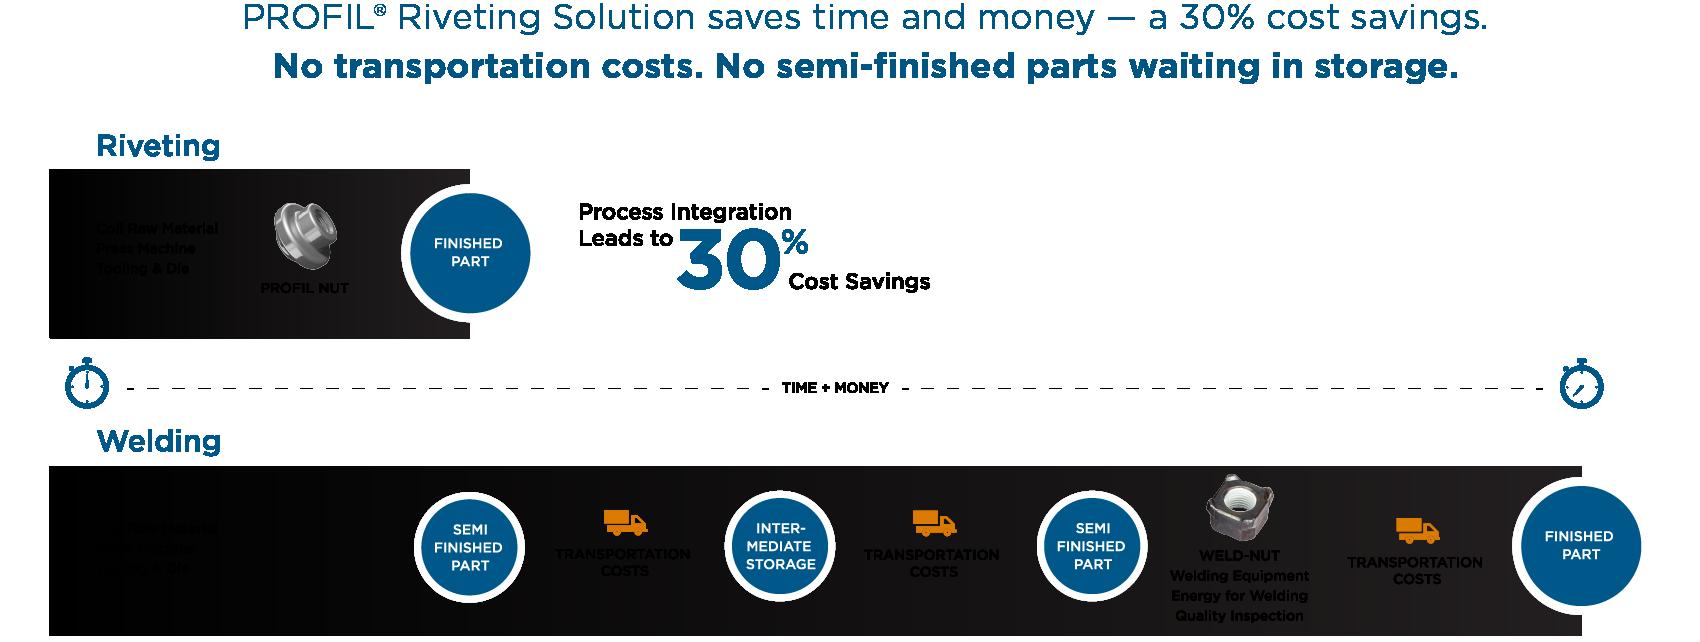 PEN-PROFIL-Riveting Solution Vs Welding-Infographic-No title